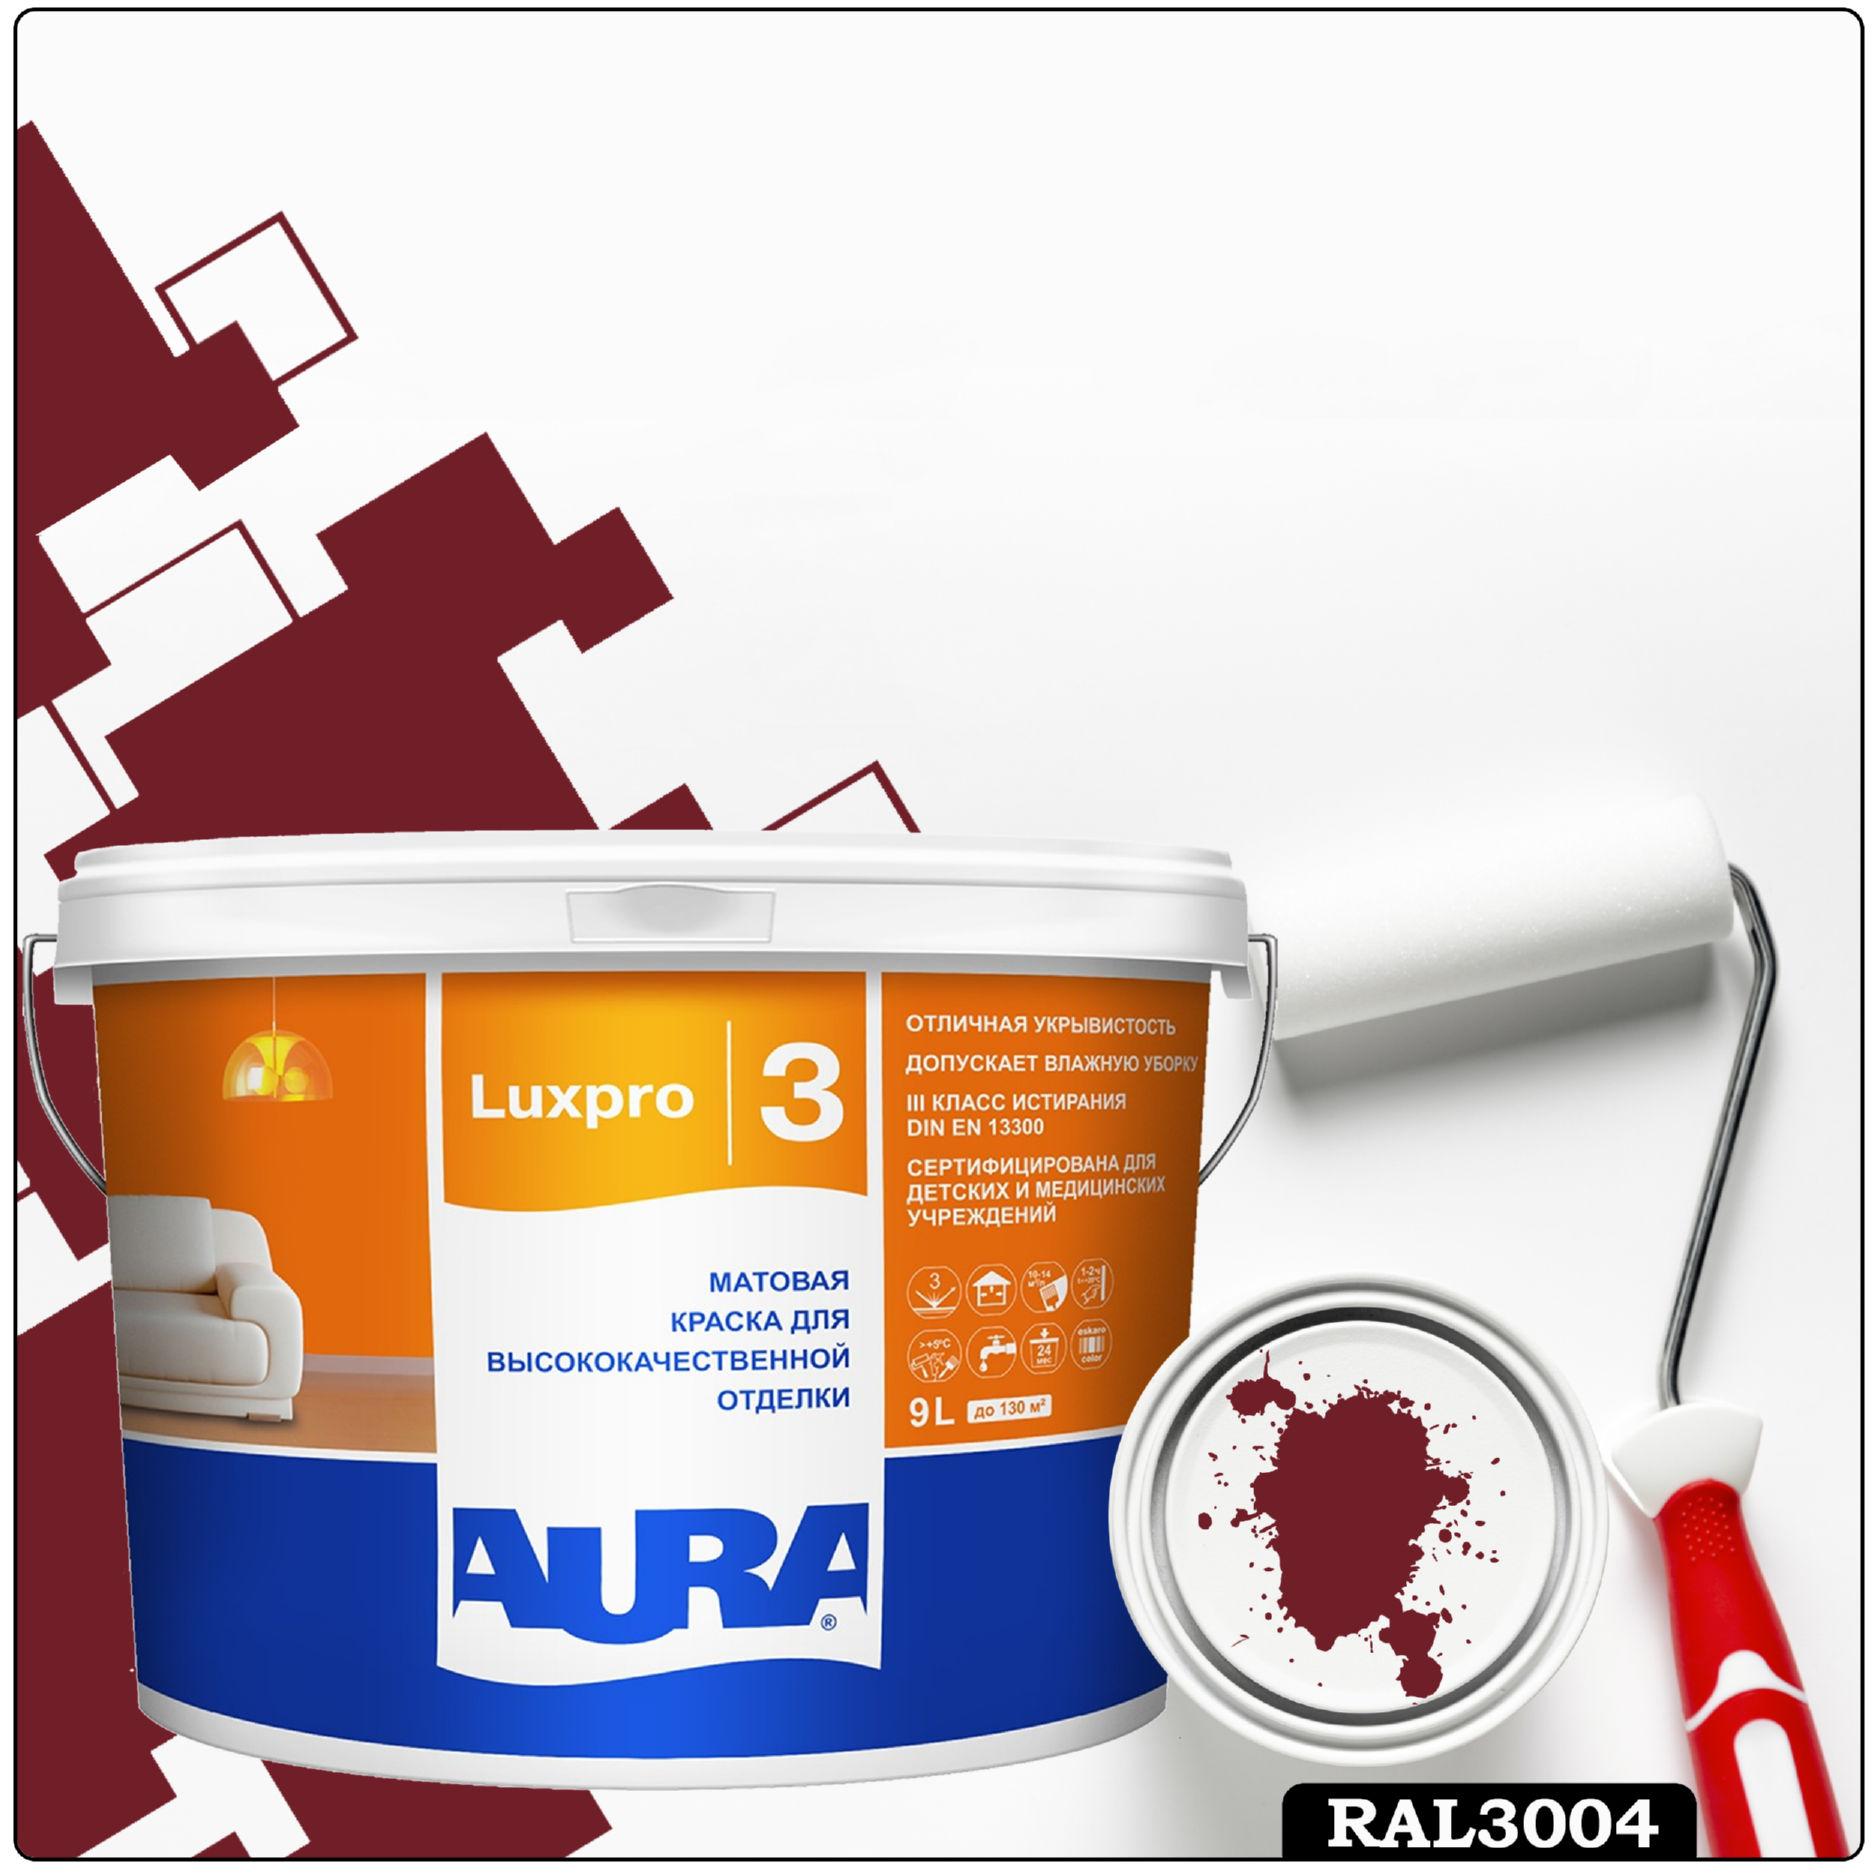 Фото 2 - Краска Aura LuxPRO 3, RAL 3004 Пурпурно-красный, латексная, шелково-матовая, интерьерная, 9л, Аура.